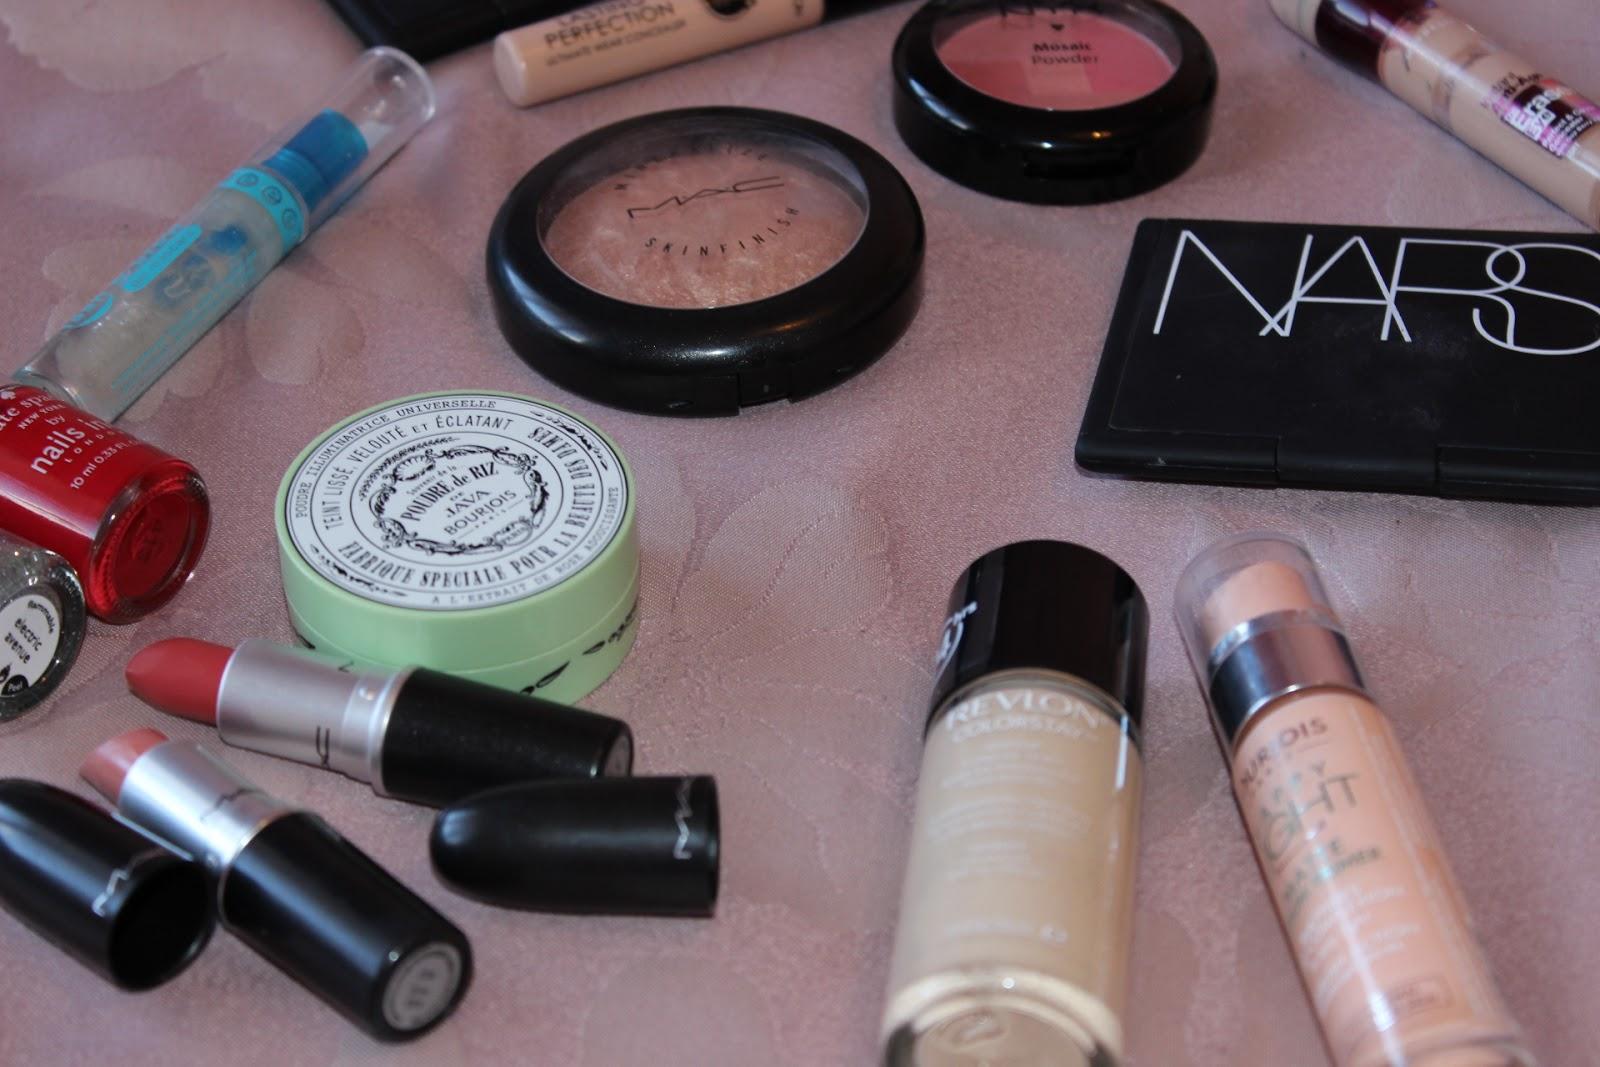 Travel Makeup Contents